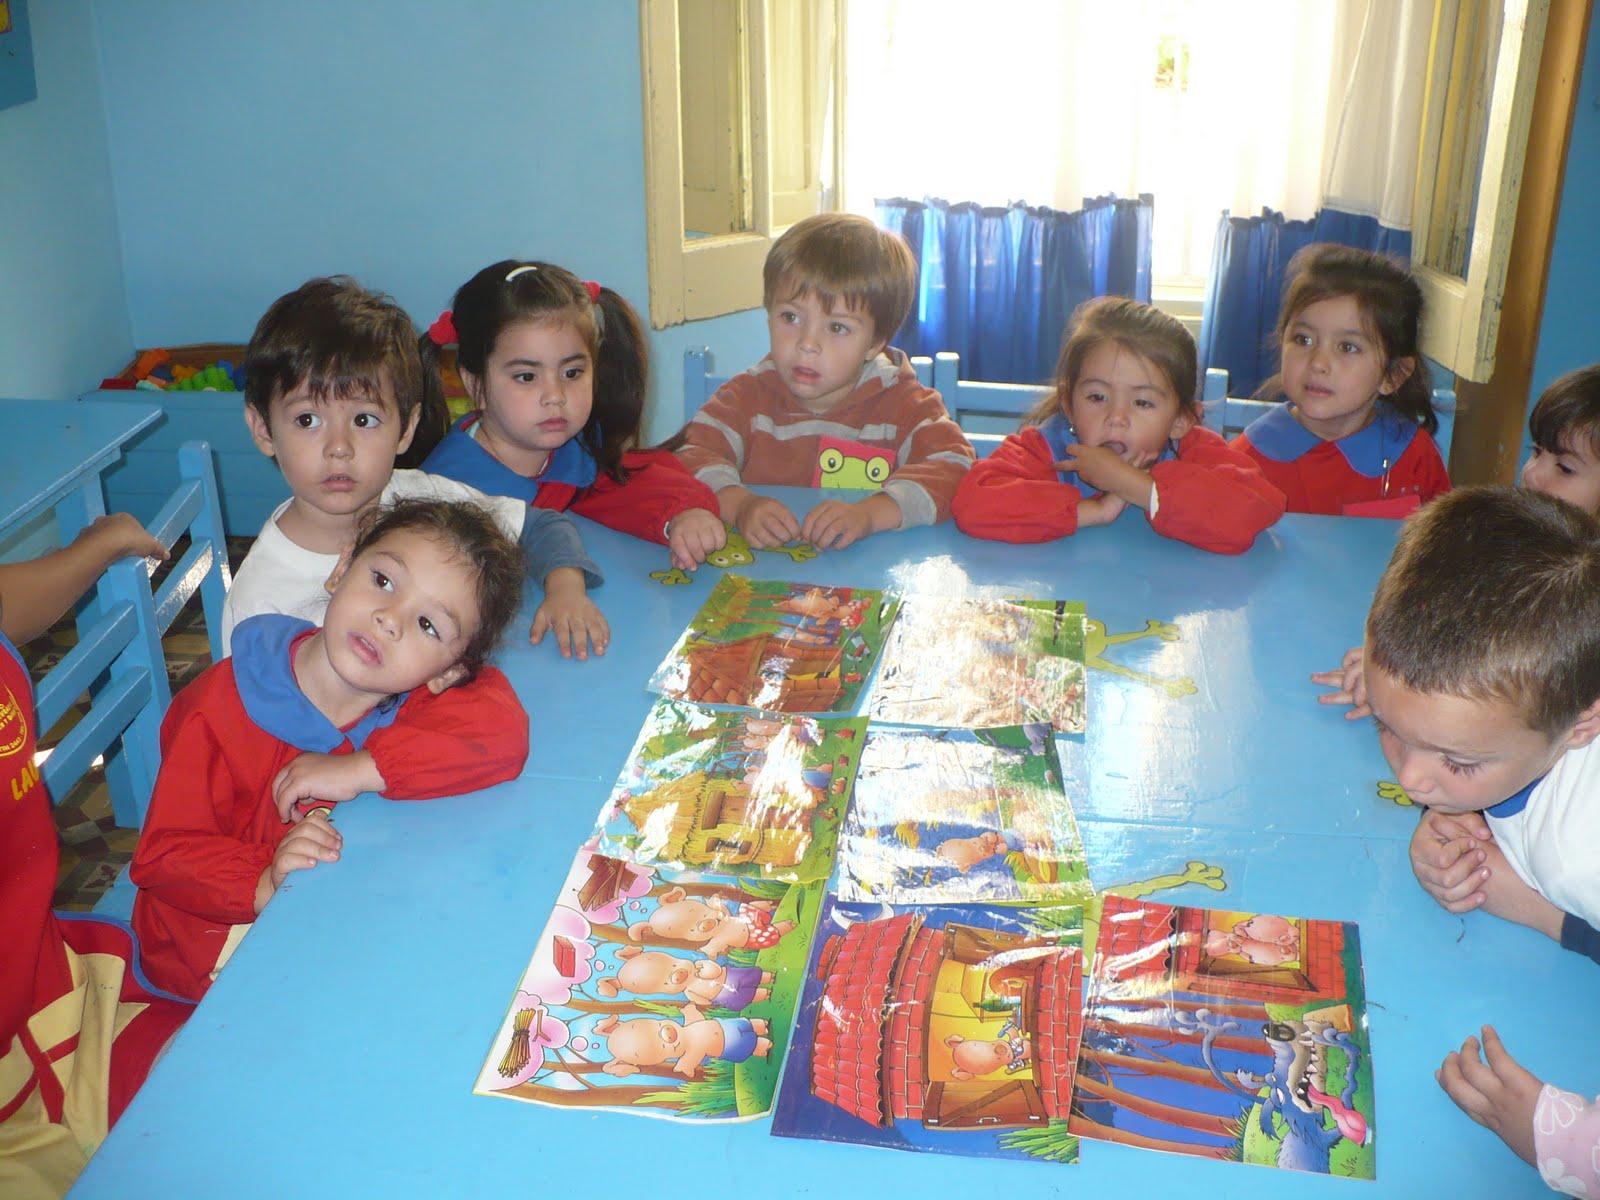 Jard n maternal las aventuras de cristian y diego for Actividades para jardin maternal